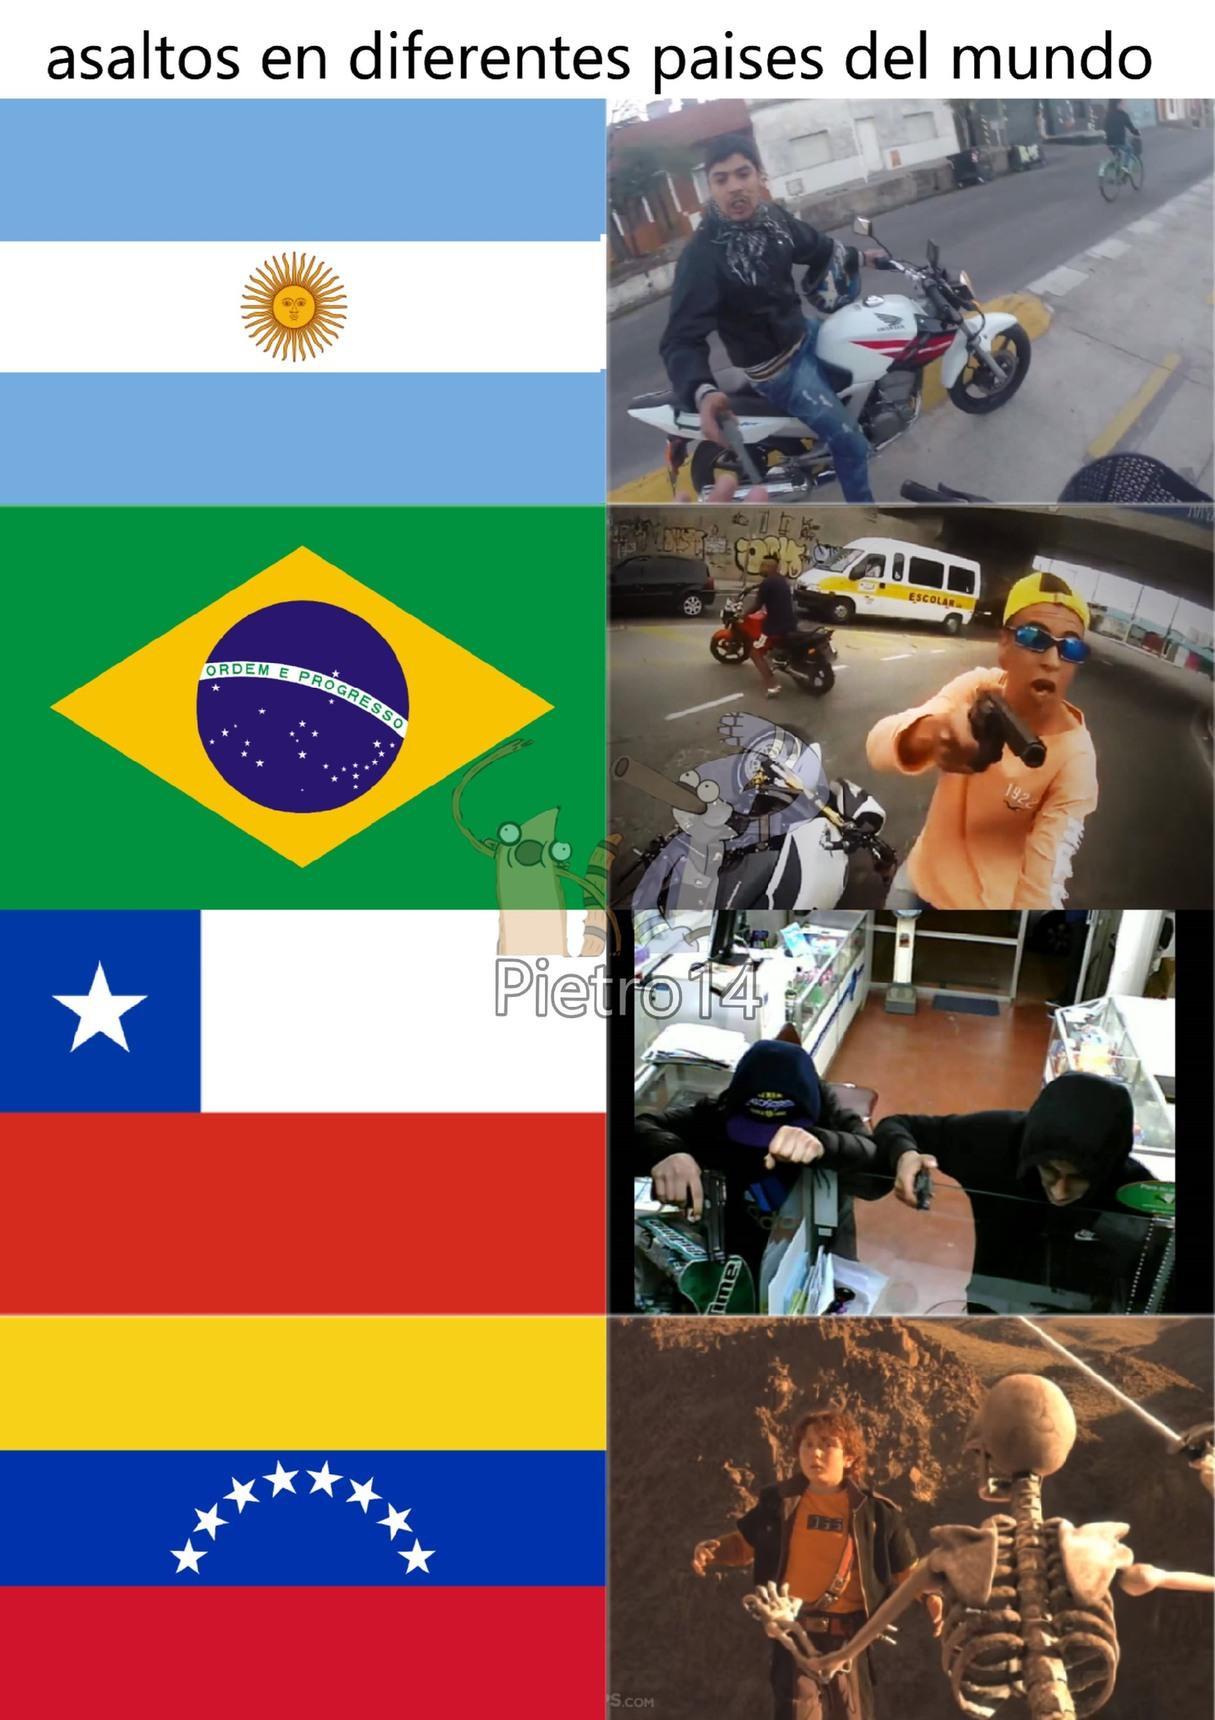 asaltos en diferentes paises del mundo - meme